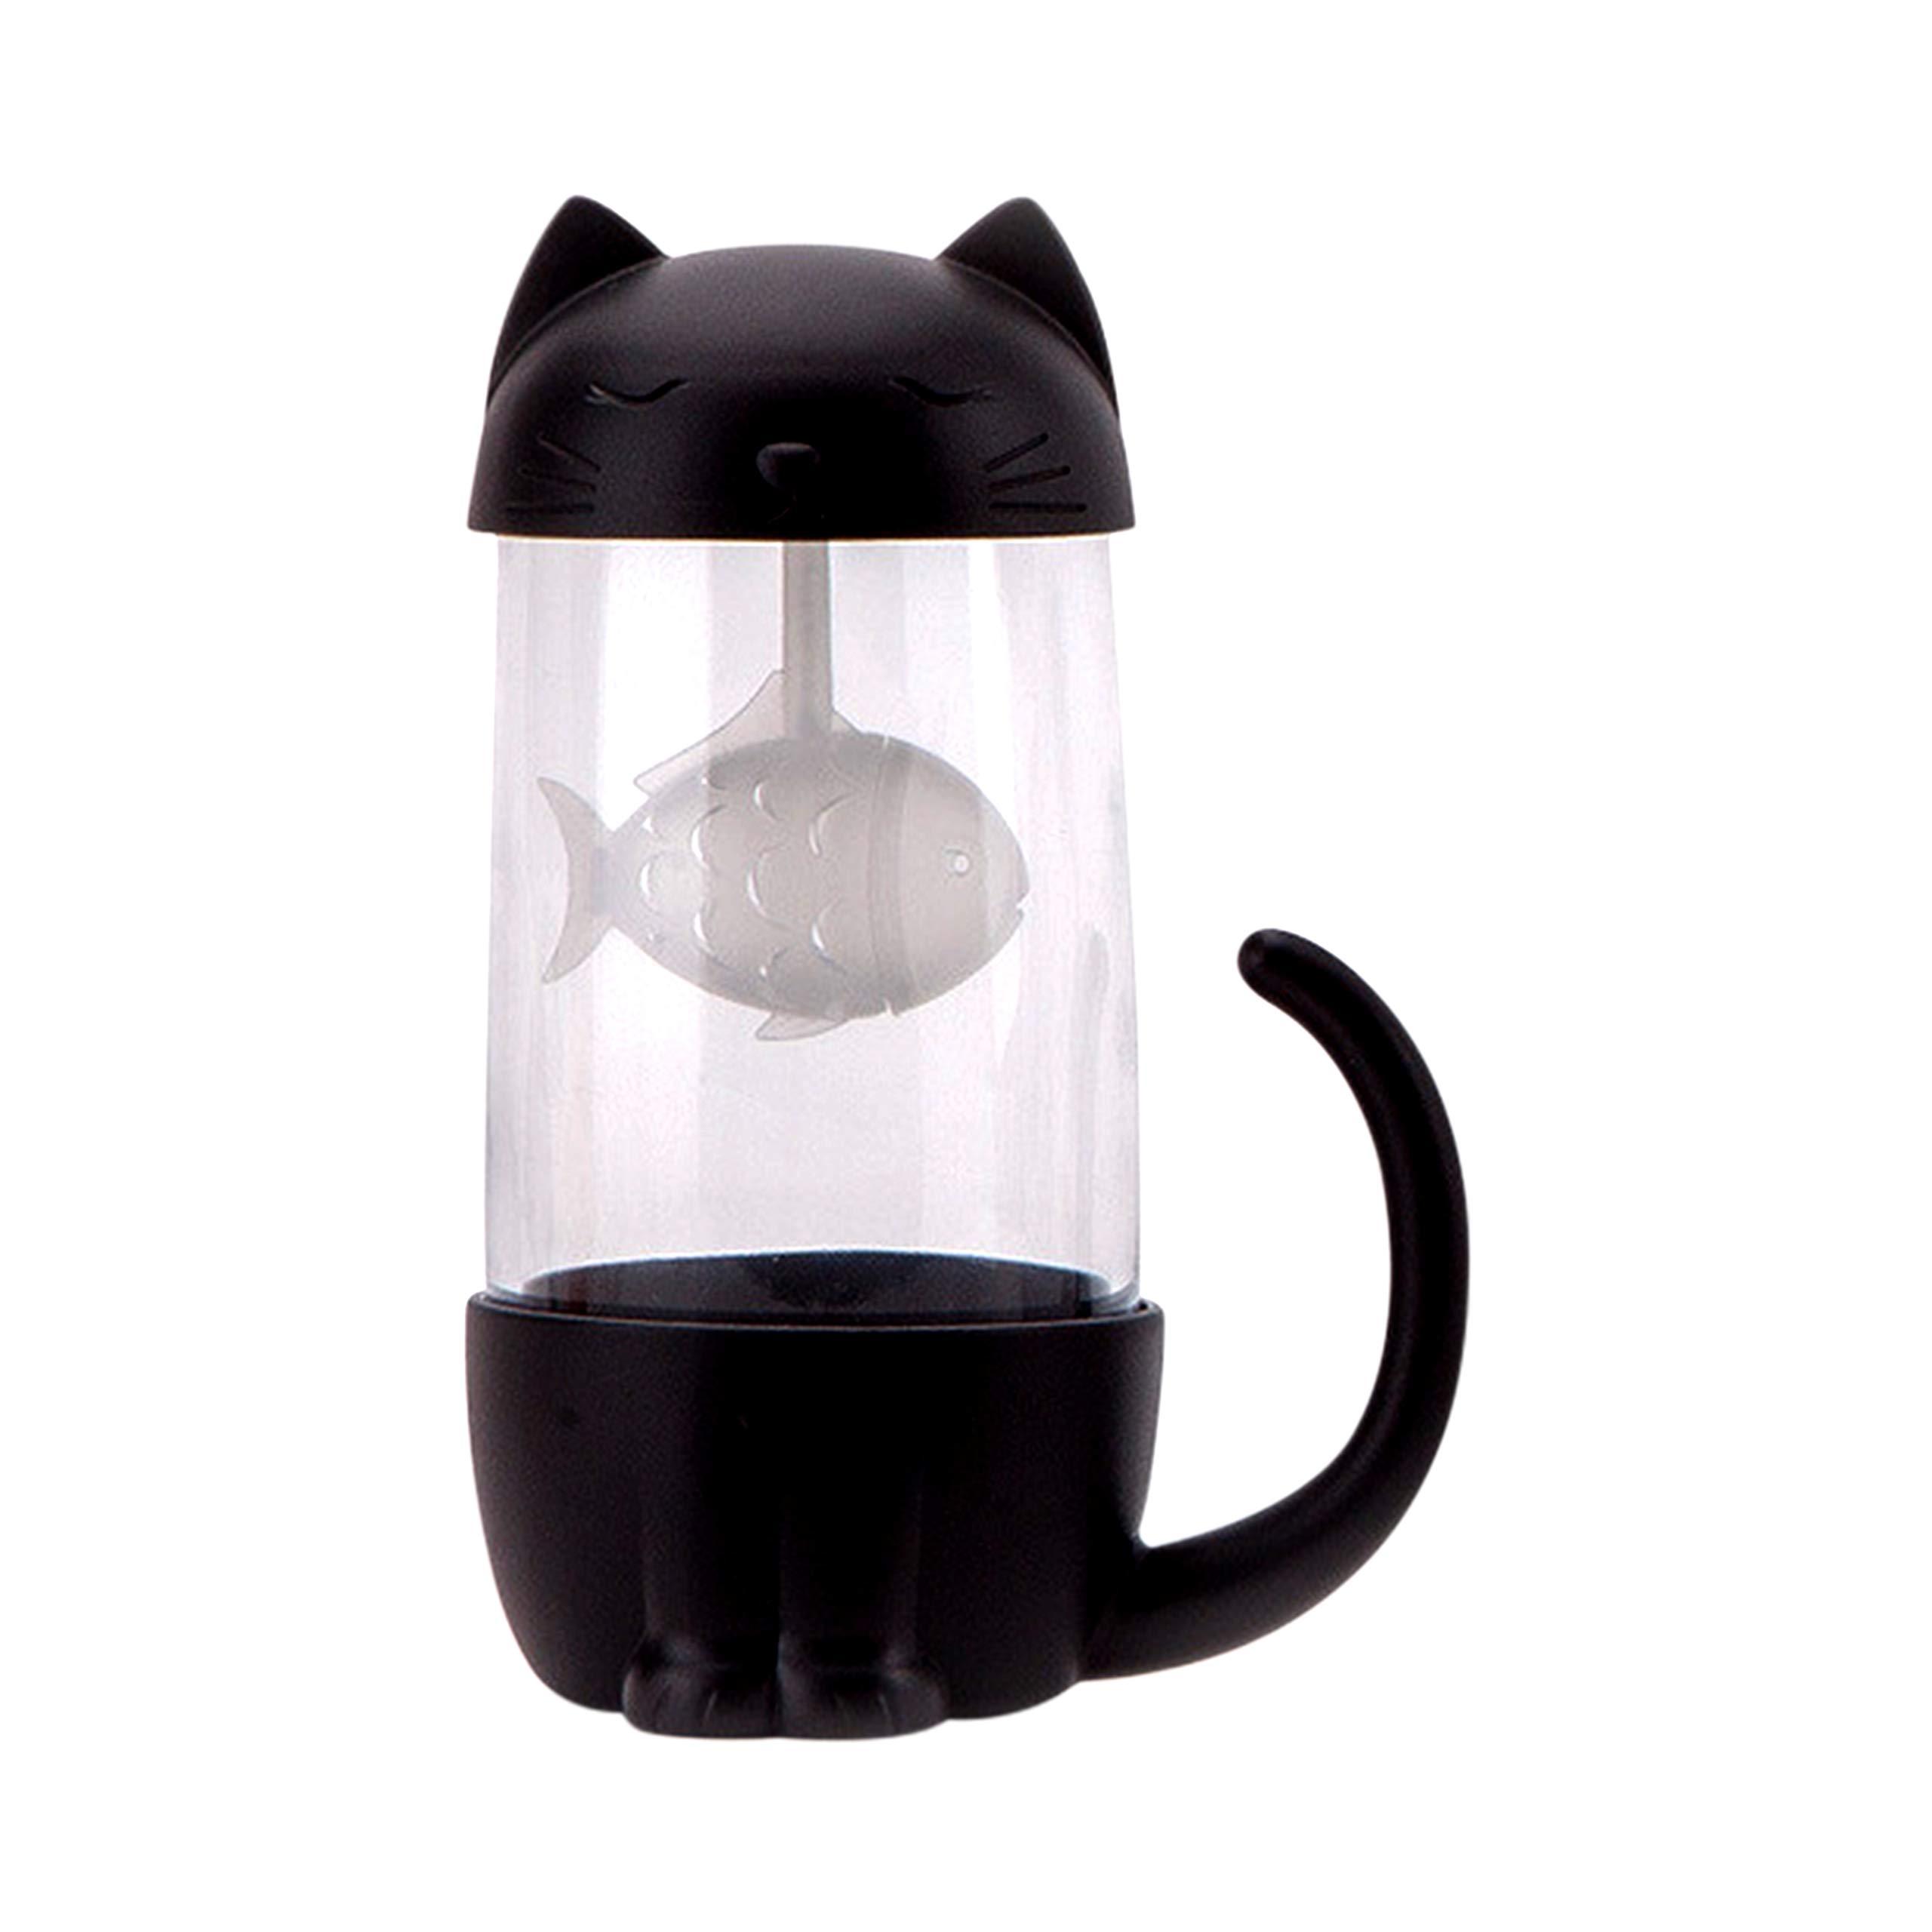 Tea mug with infuser lid - Cute Cat Glass - Tea Cups Infuser - Mug Teacup Cat Dog (cat/black) Cat Gift